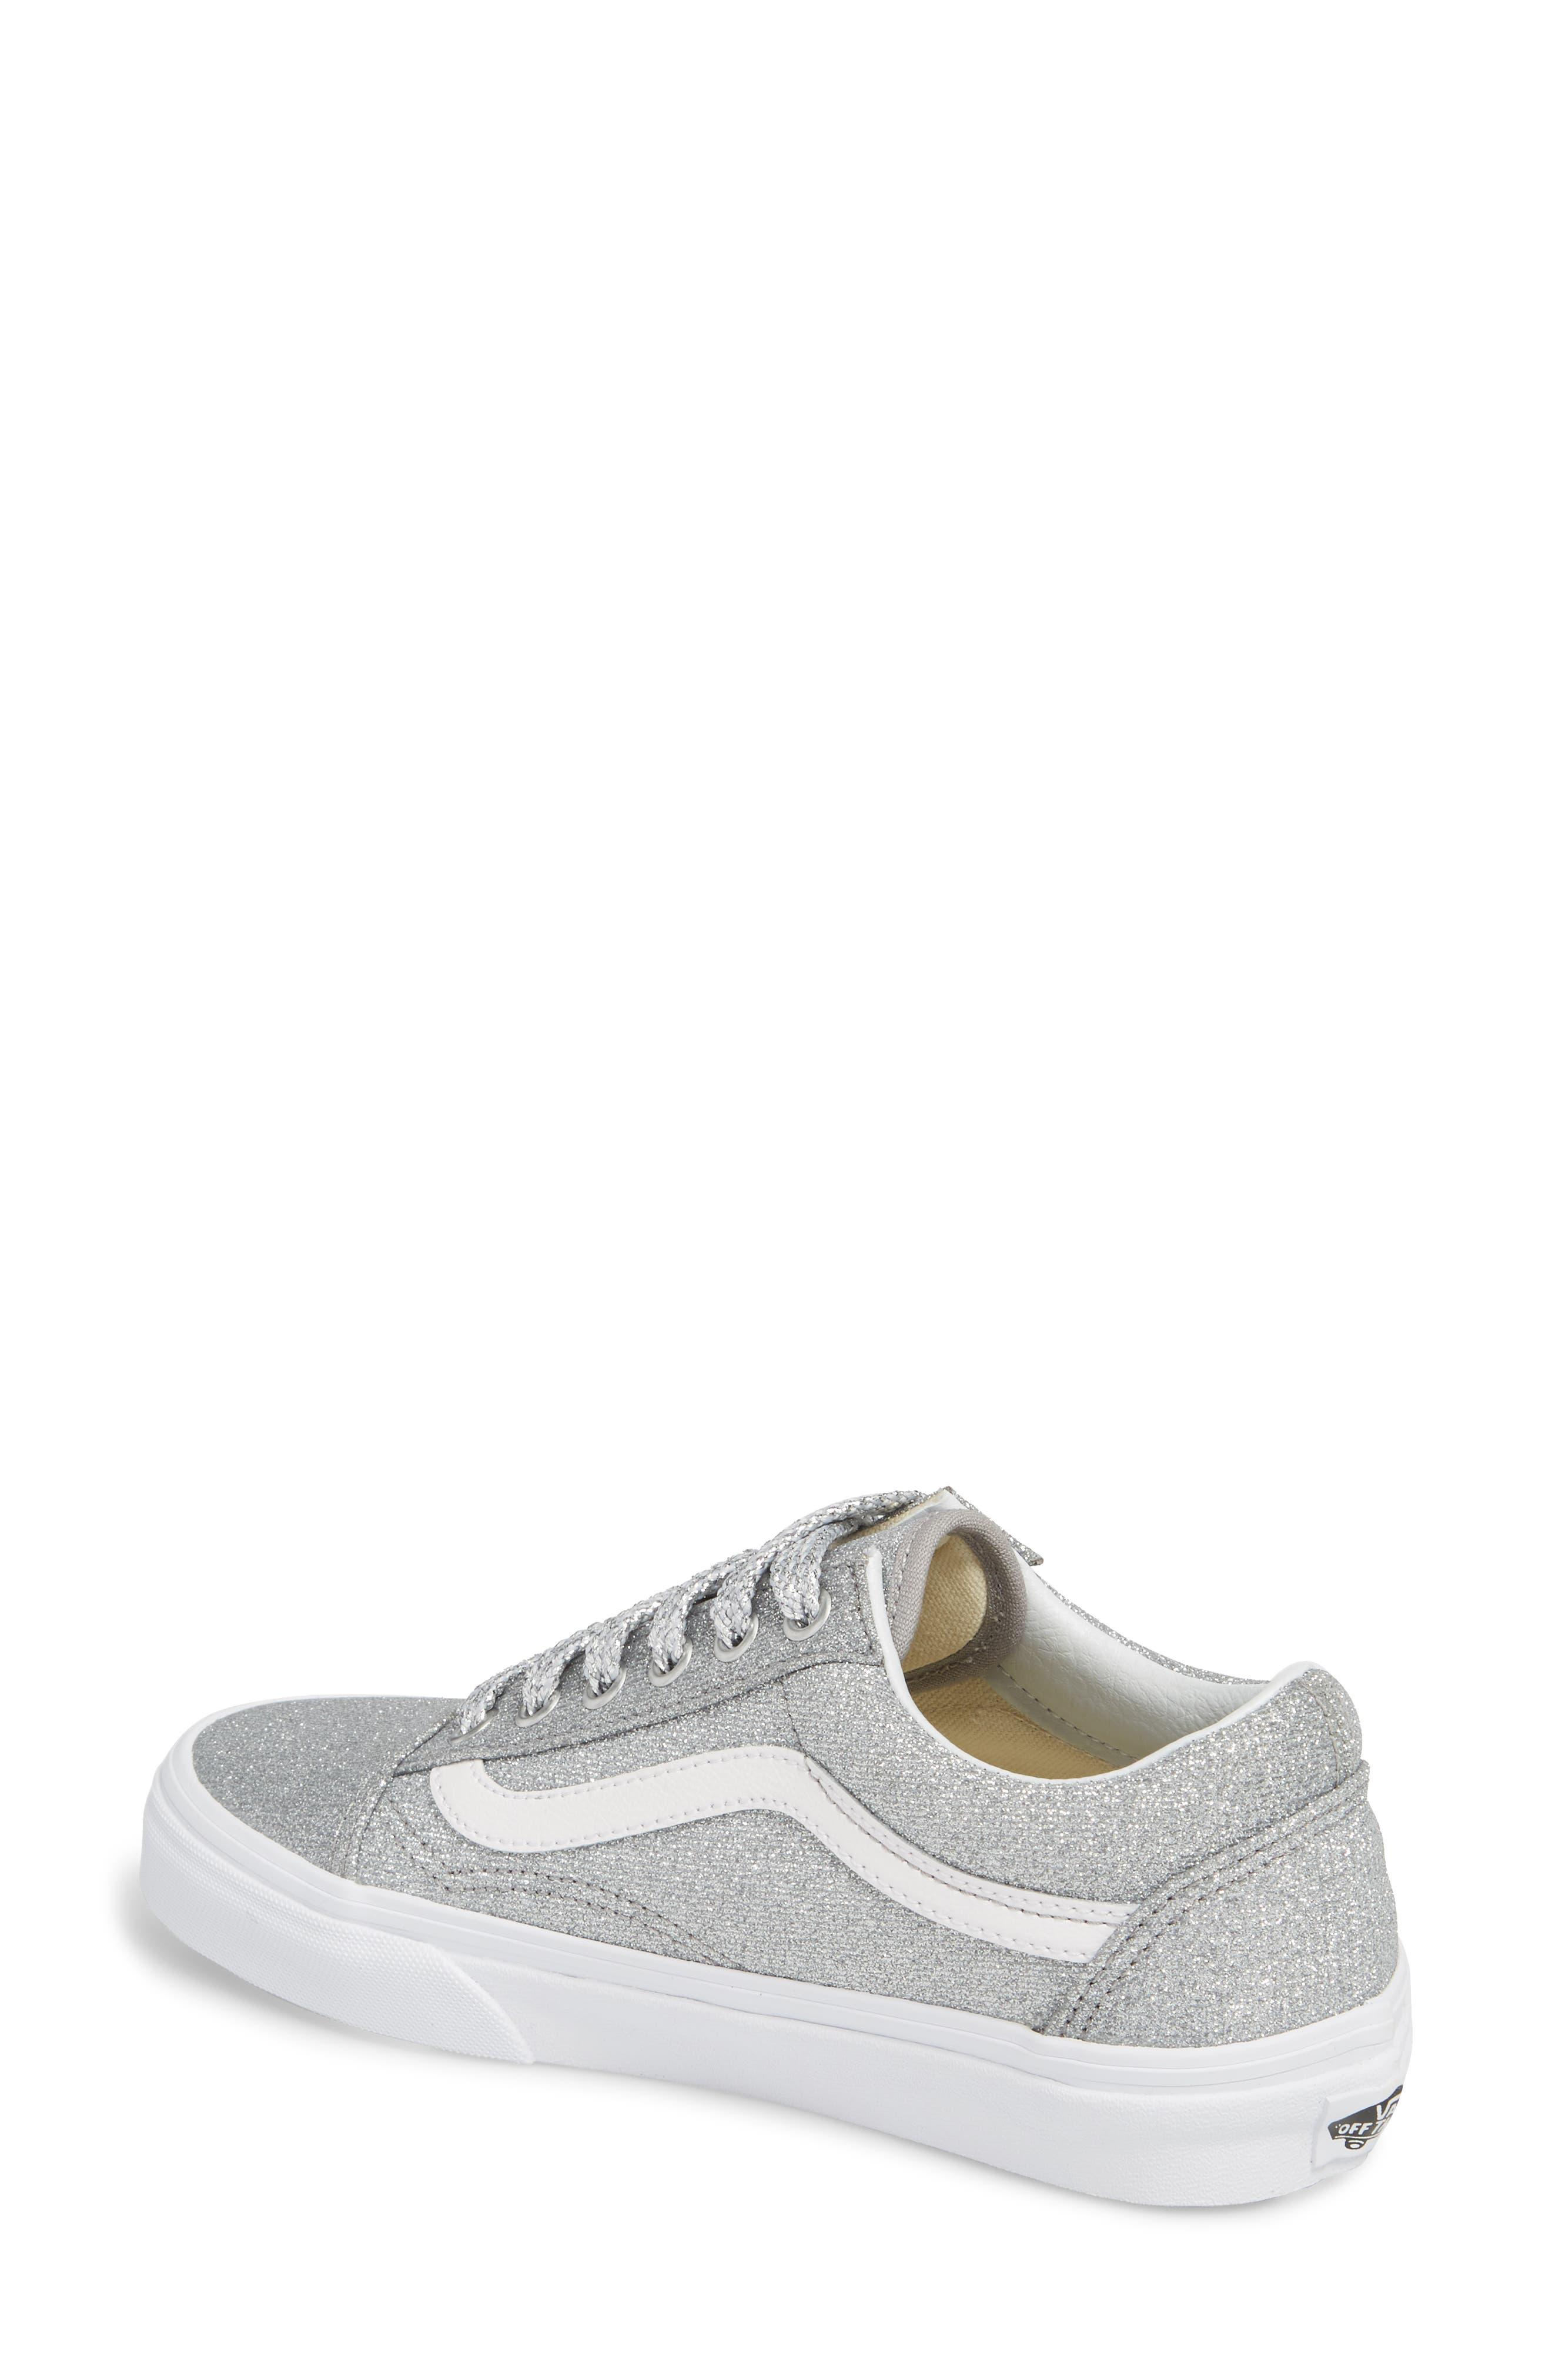 UA Old Skool Glitter Low Top Sneaker,                             Alternate thumbnail 2, color,                             SILVER/ TRUE WHITE GLITTER